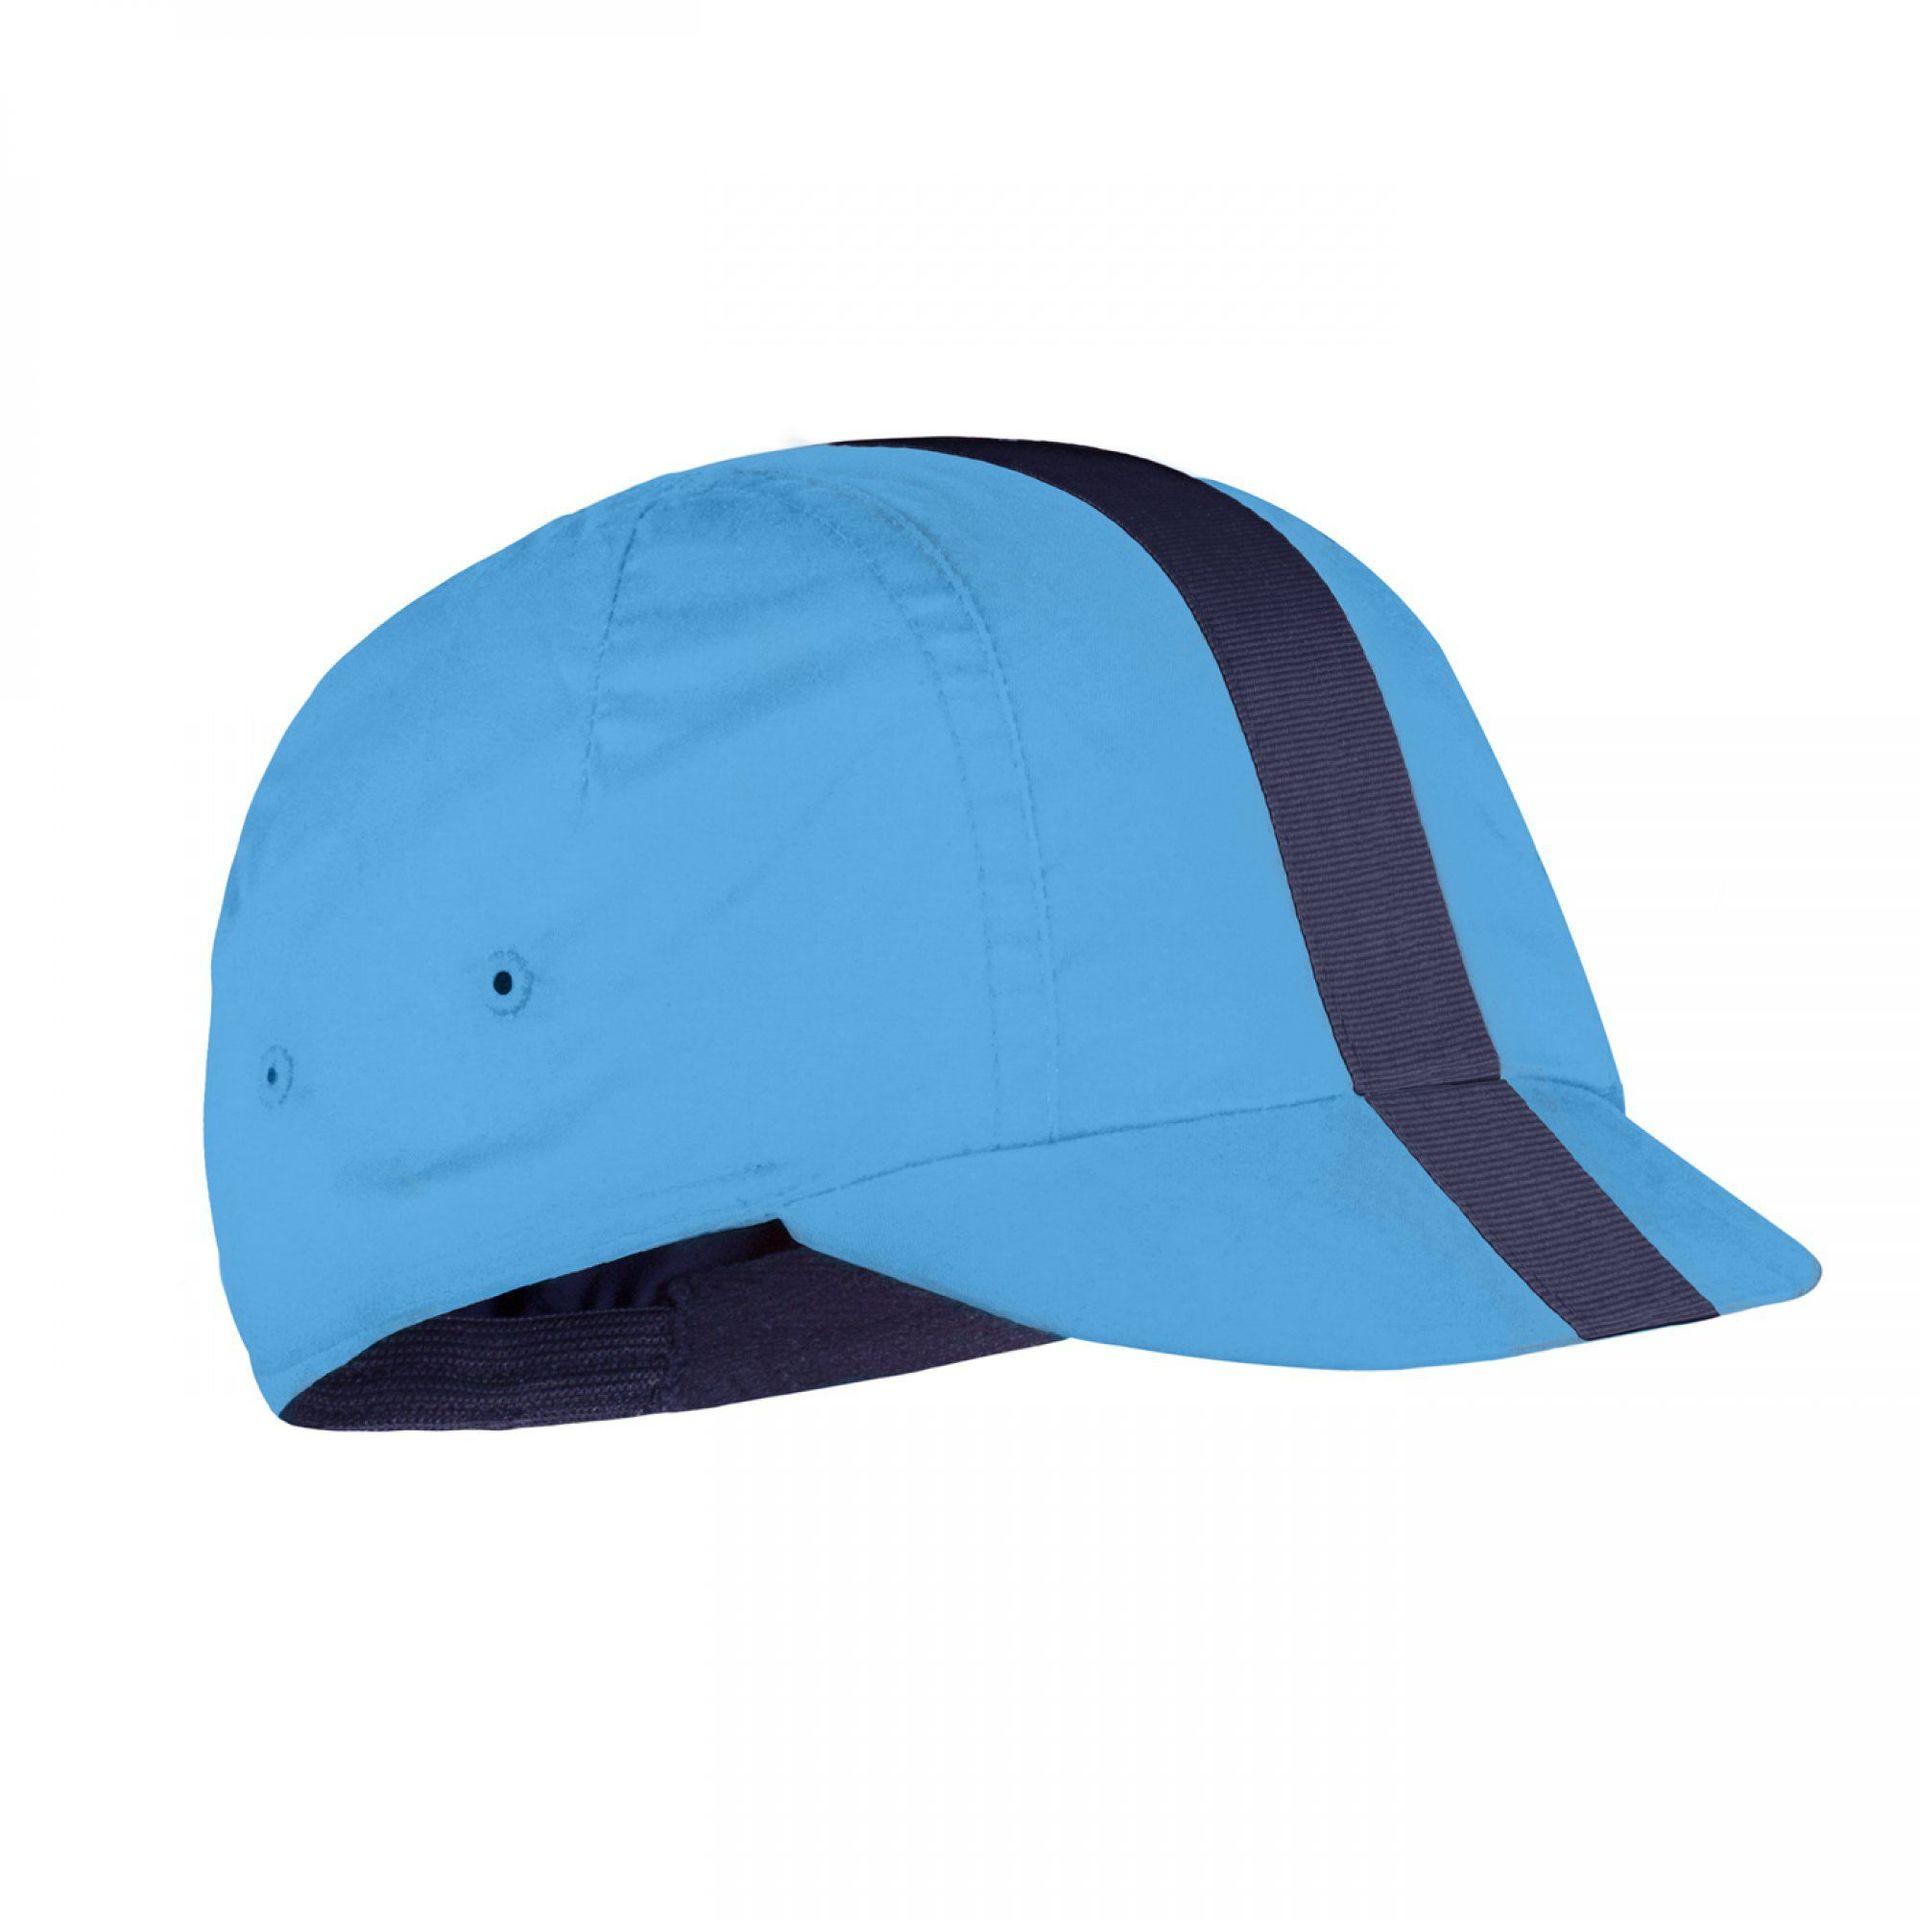 CZAPKA ROWEROWA POC FONDO CAP SEABORGIUM BLUE